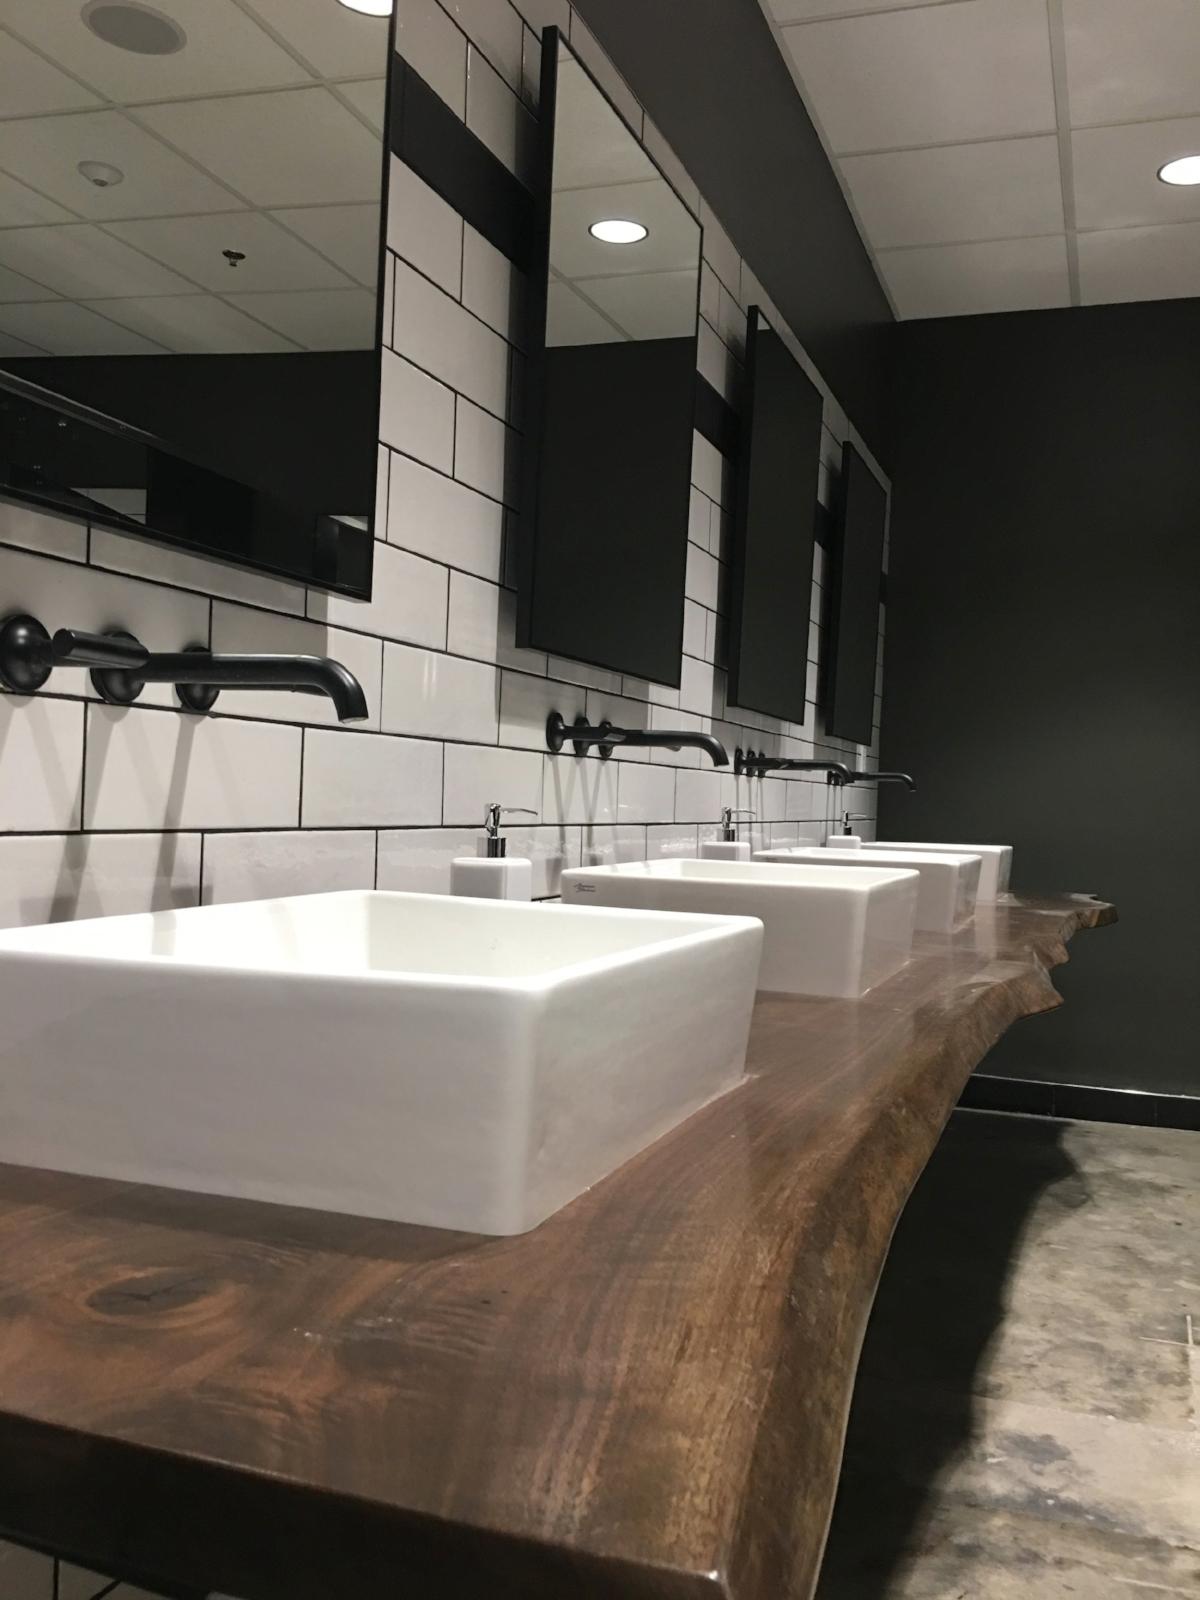 Live edge wood countertop with epoxy sealant